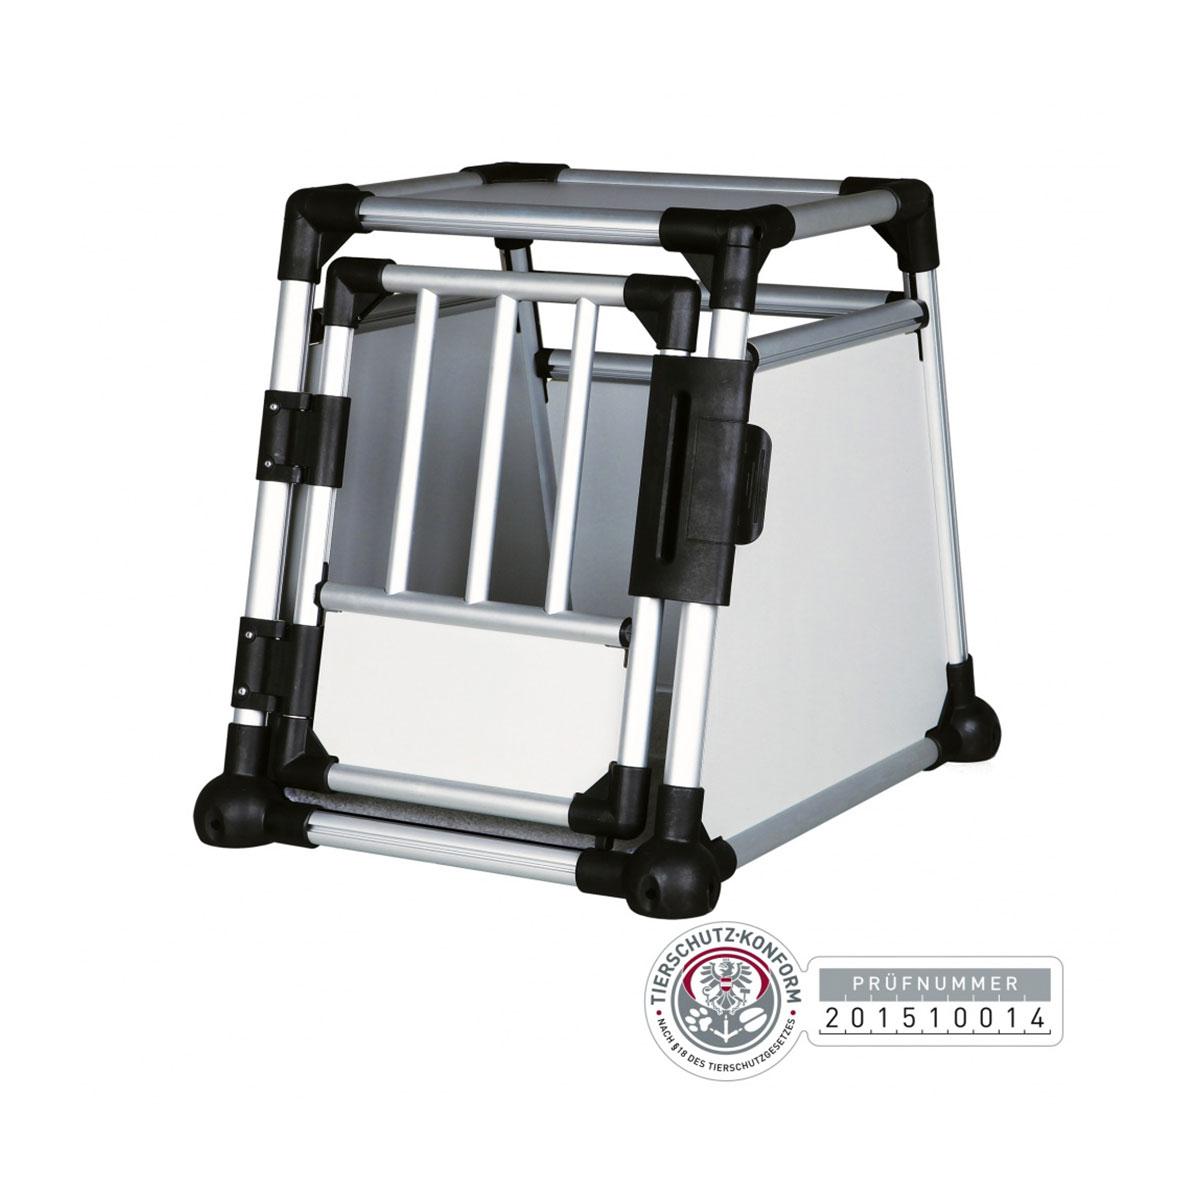 Trixie Transportbox Aluminium kaufen bei ZooRoyal